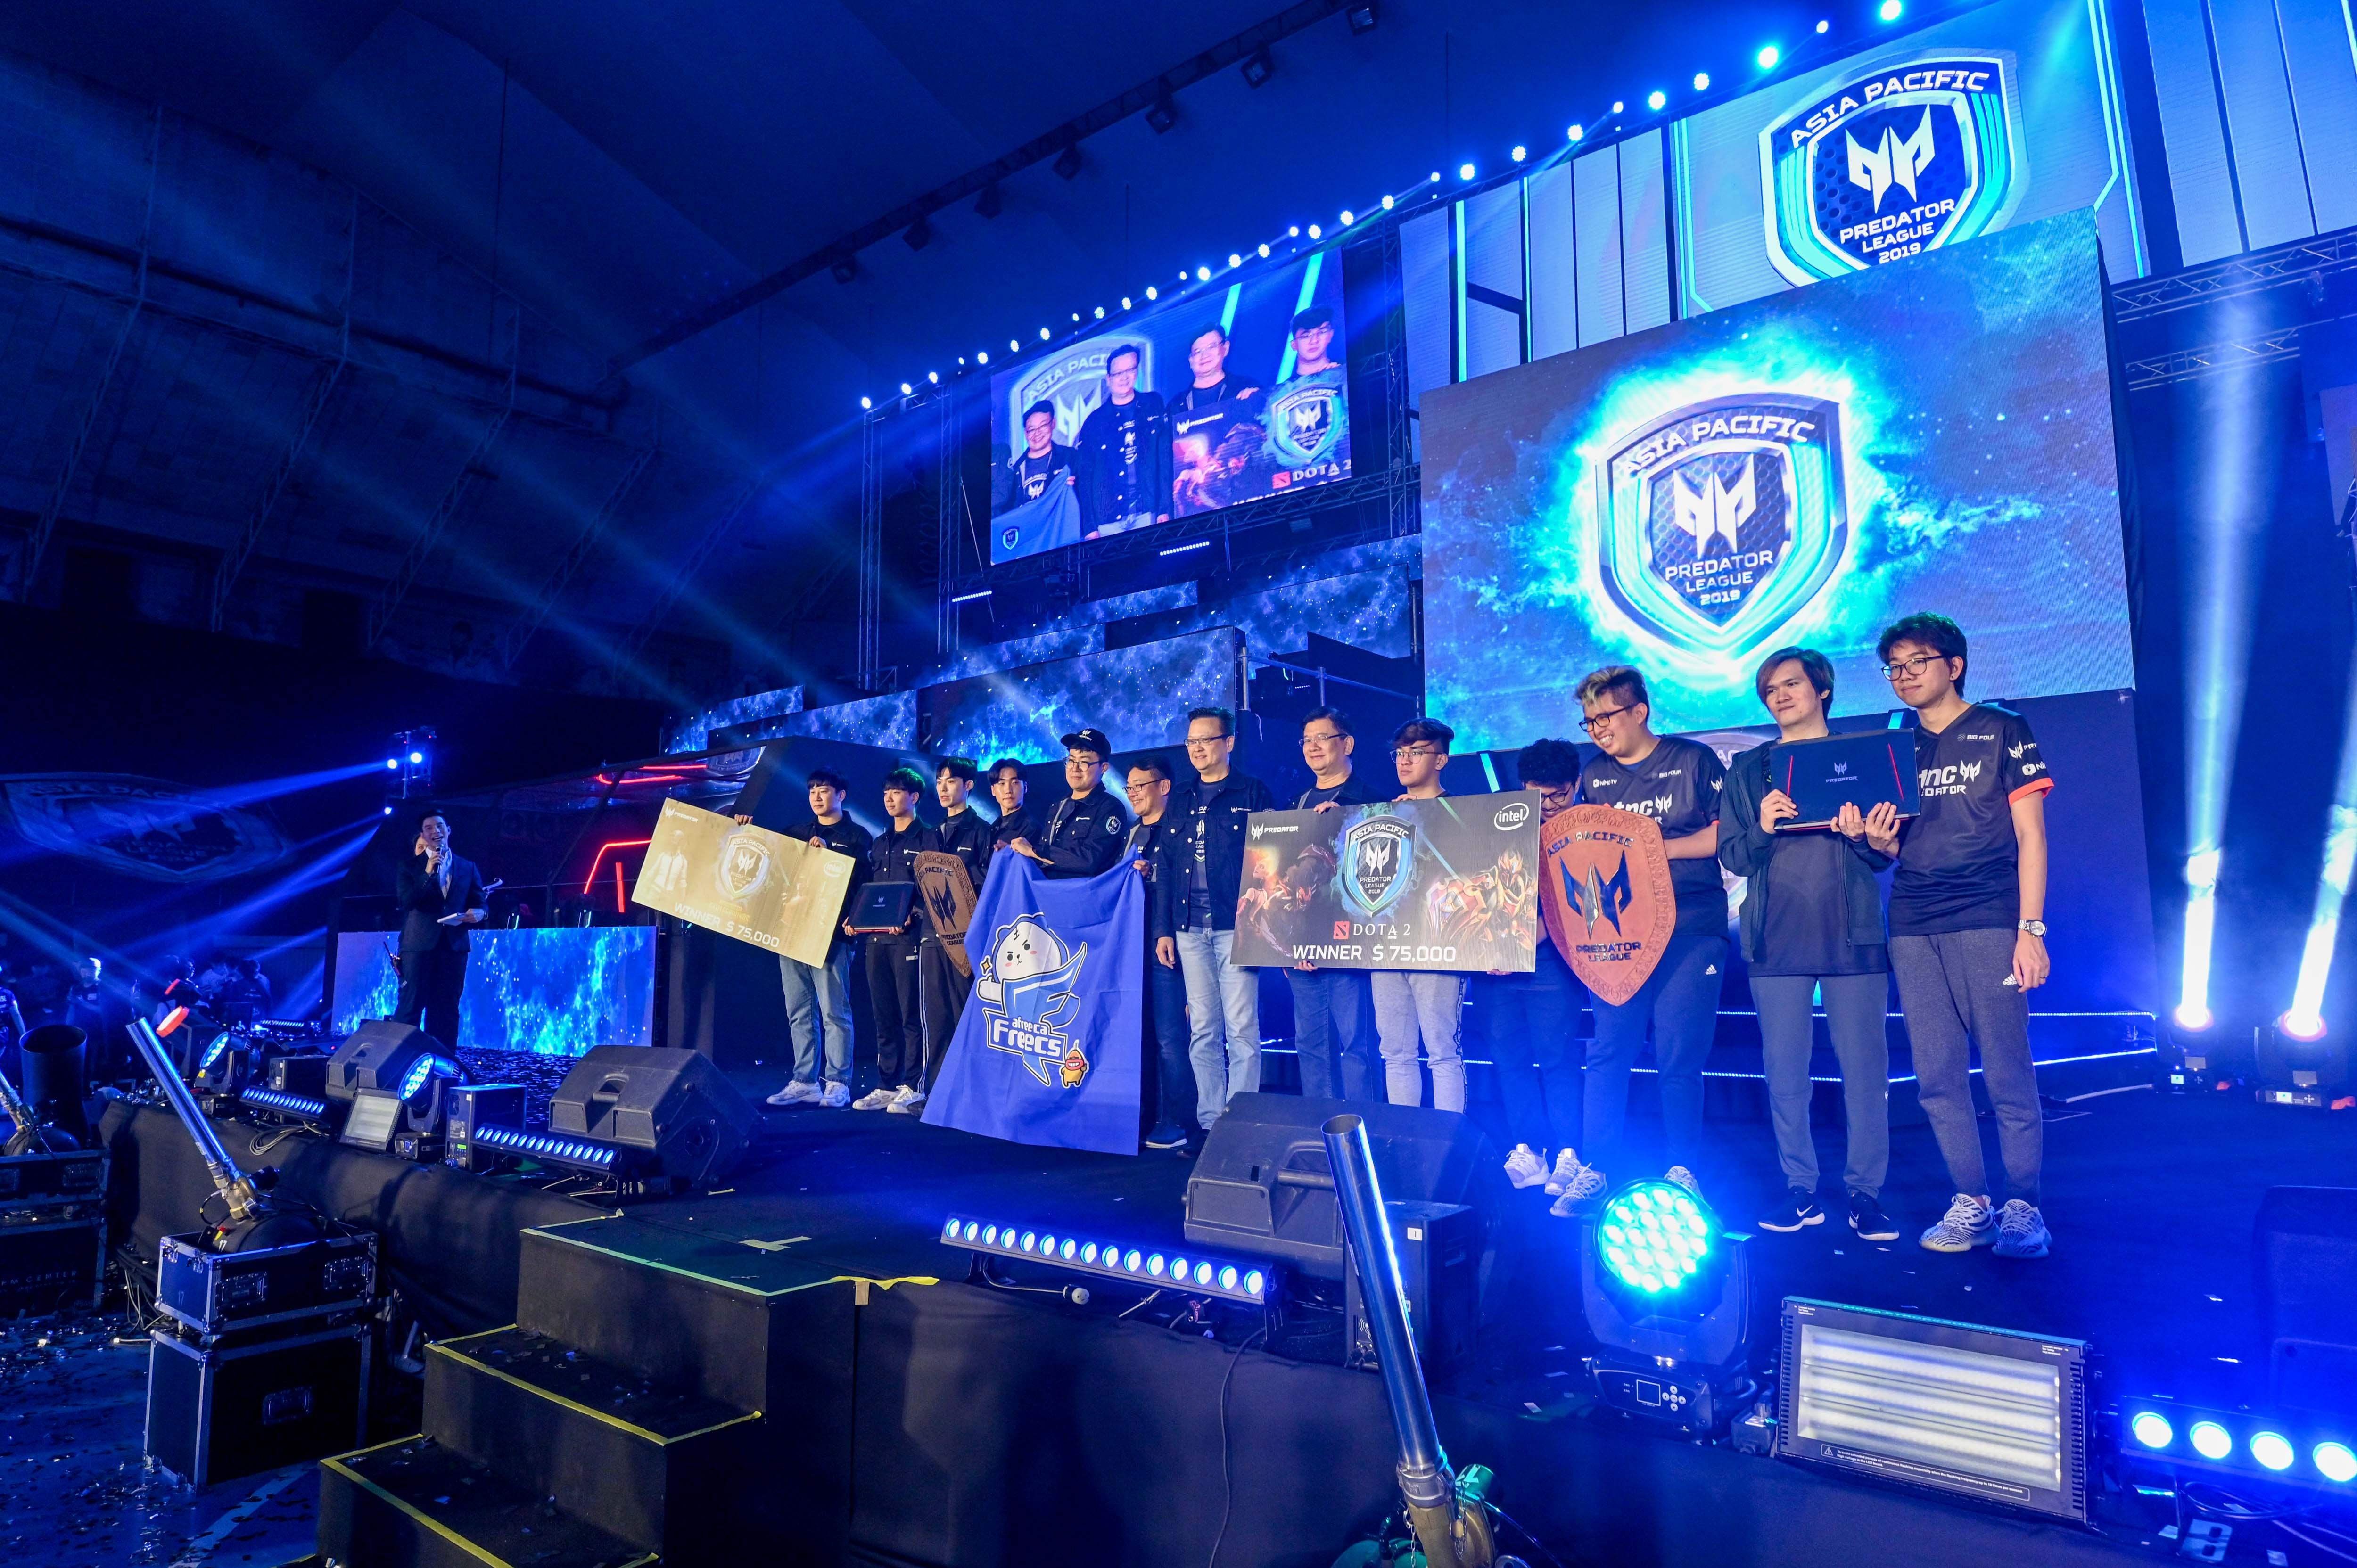 12 dsc 3642 17 02 19 บรรยากาศงาน Asia Pacific Predator League 2019 สุดยอดขุนพลทีมอีสปอร์ตเข้าร่วมการแข่งขันรอบแกรนด์ไฟนอล